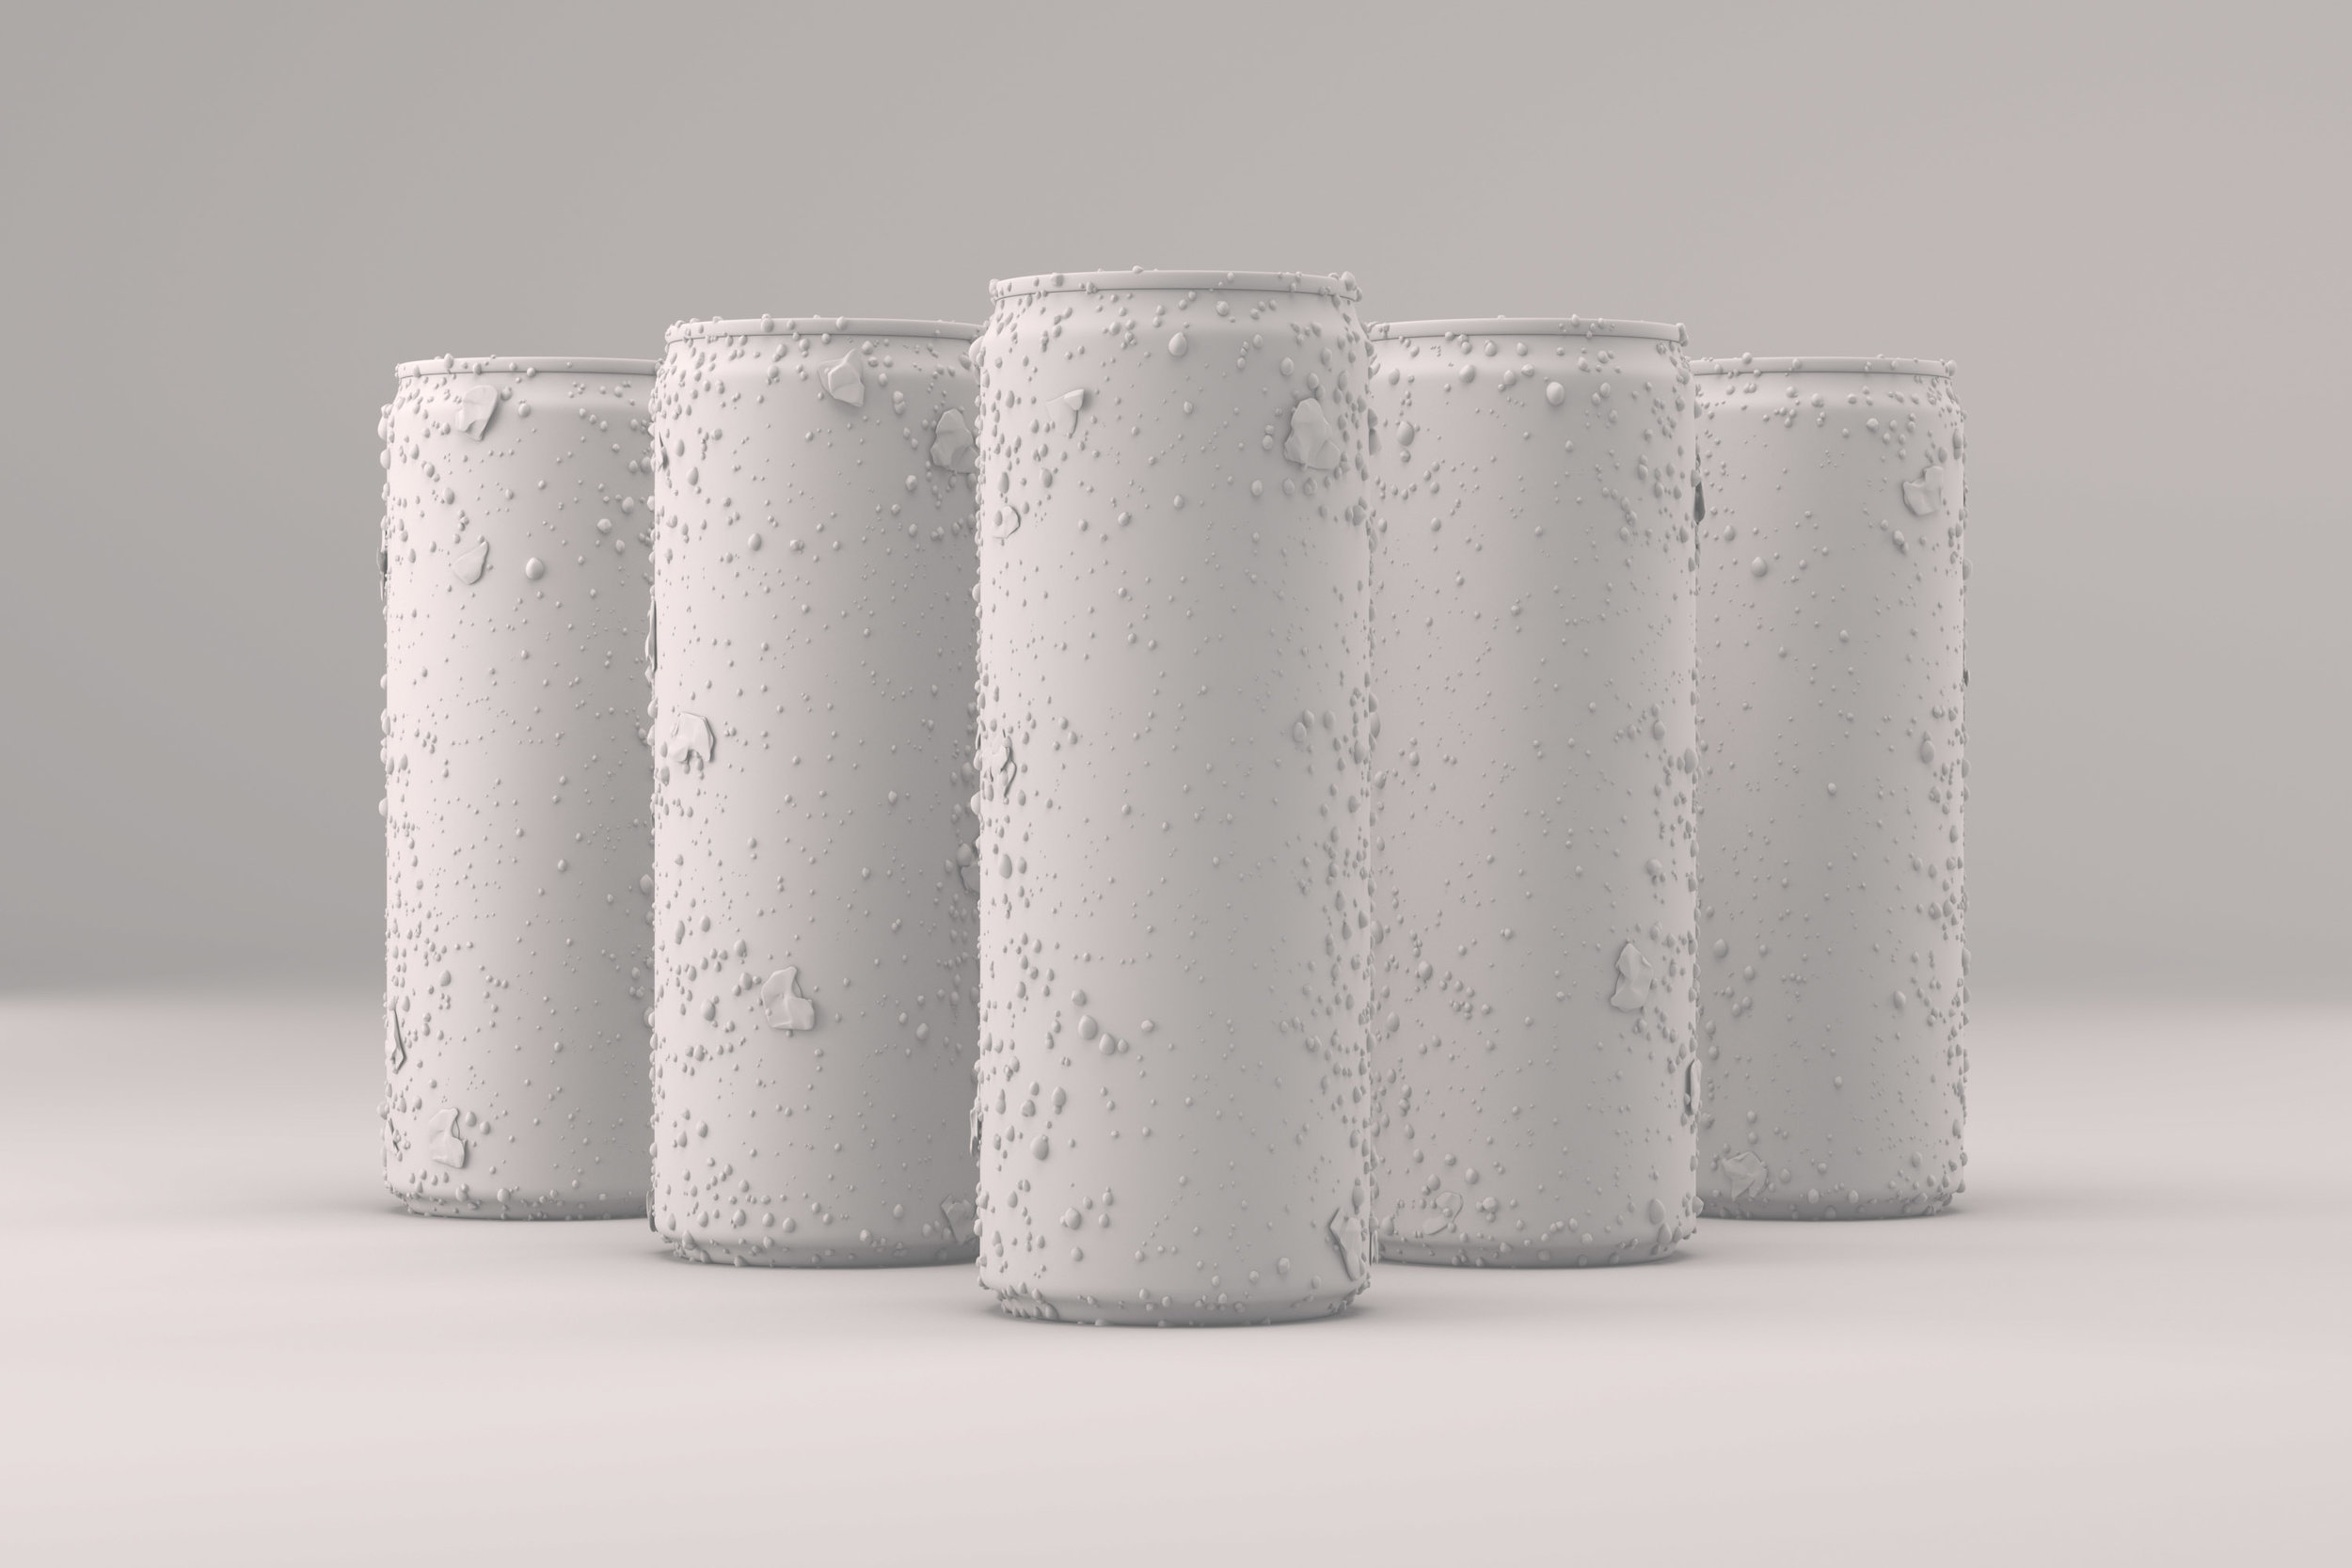 Coca Cola Classic - Five LineUp Snow - Metric - JHåland_1-diff.jpg